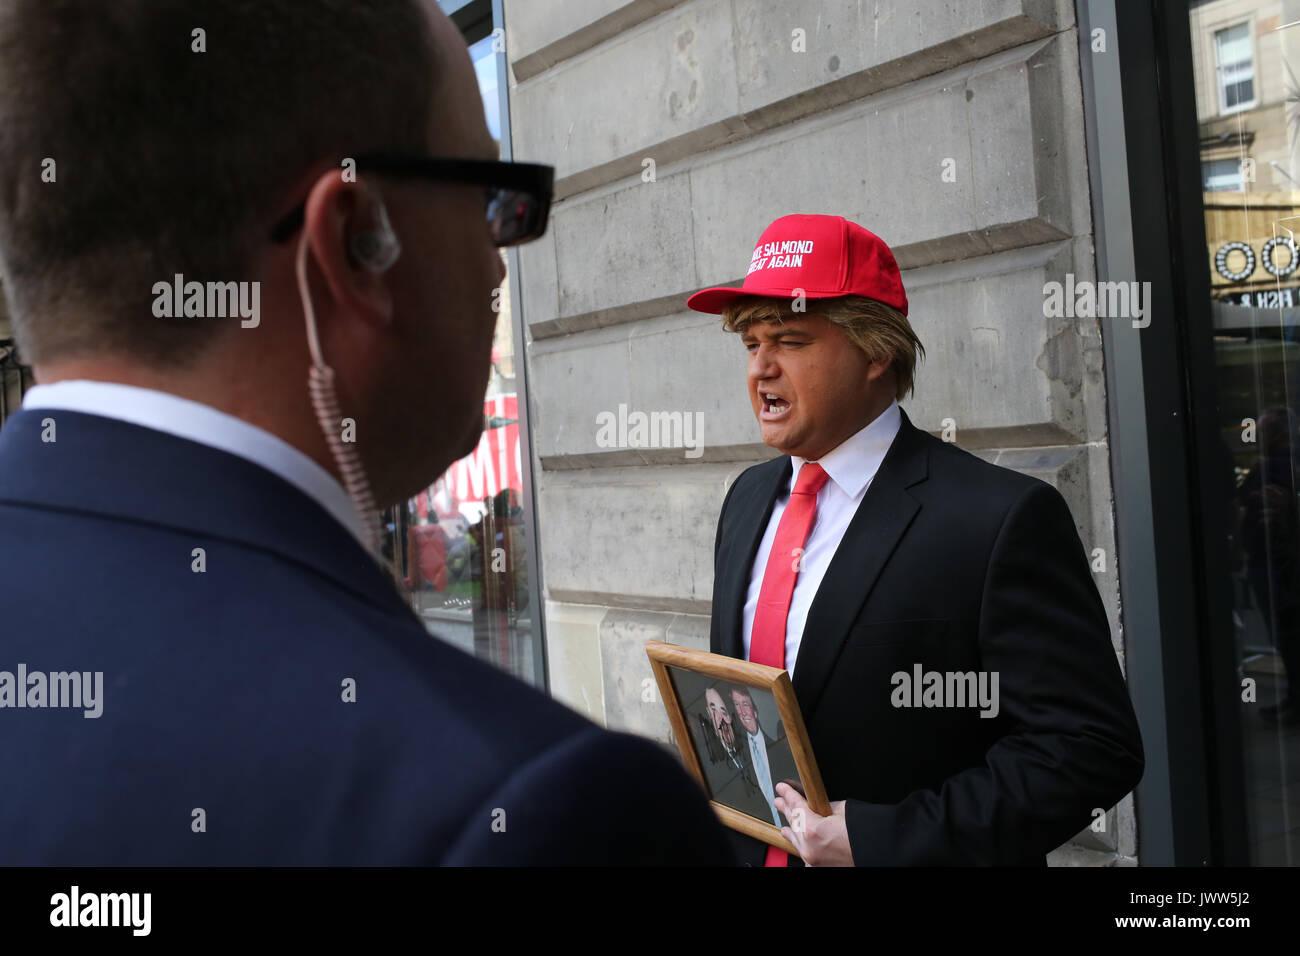 Edinburgh, Scotland, UK. 13th Aug, 2017. 'Donald Trump' (Danny Posthill an Impressionist) waits outside the Assembly Stock Photo